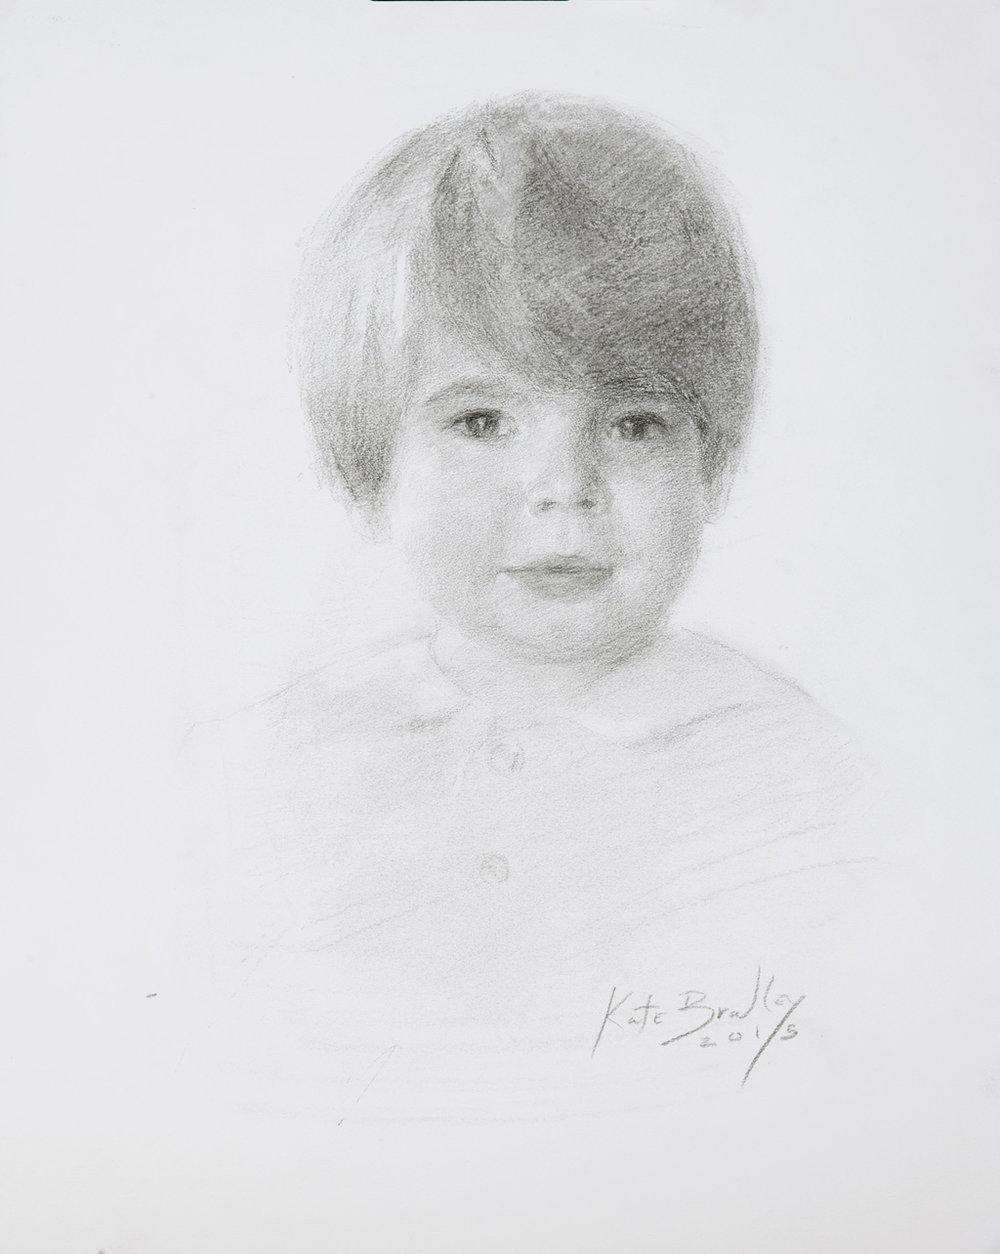 Virgil Love, Age 3, Oil